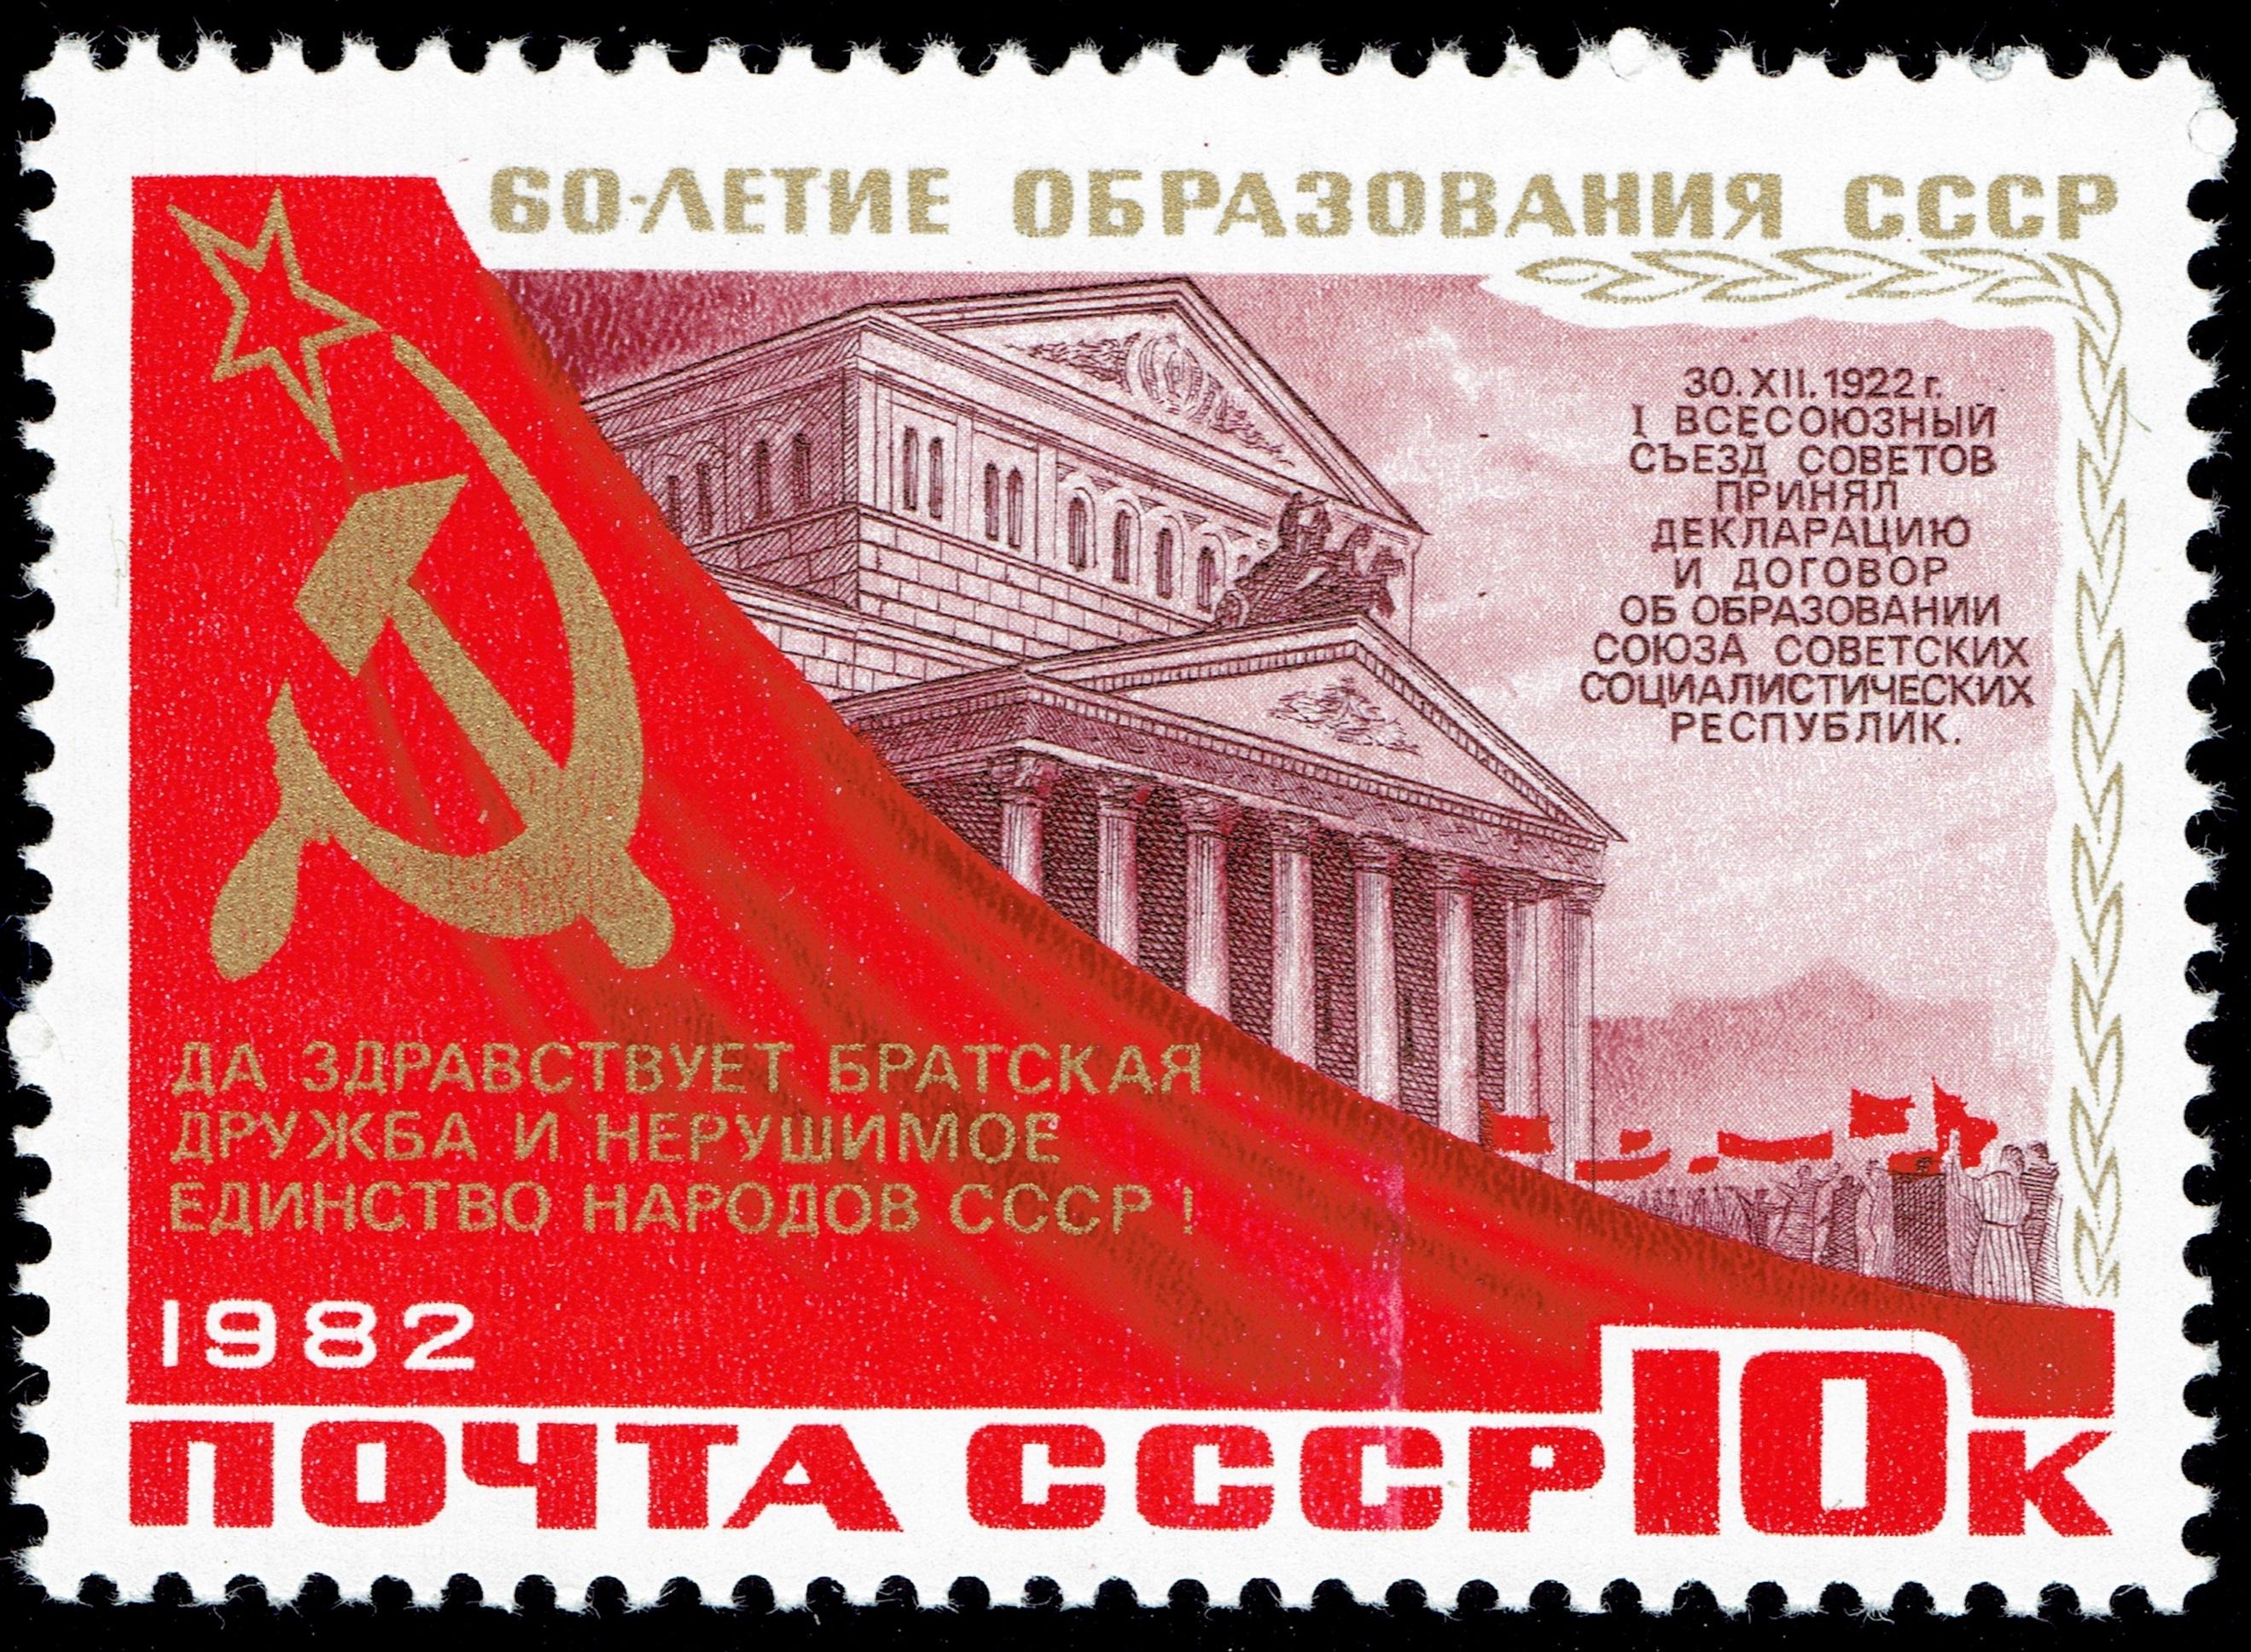 Union of Soviet Socialist Republics - Scott #5091 (1982): House of the Soviets, Moscow